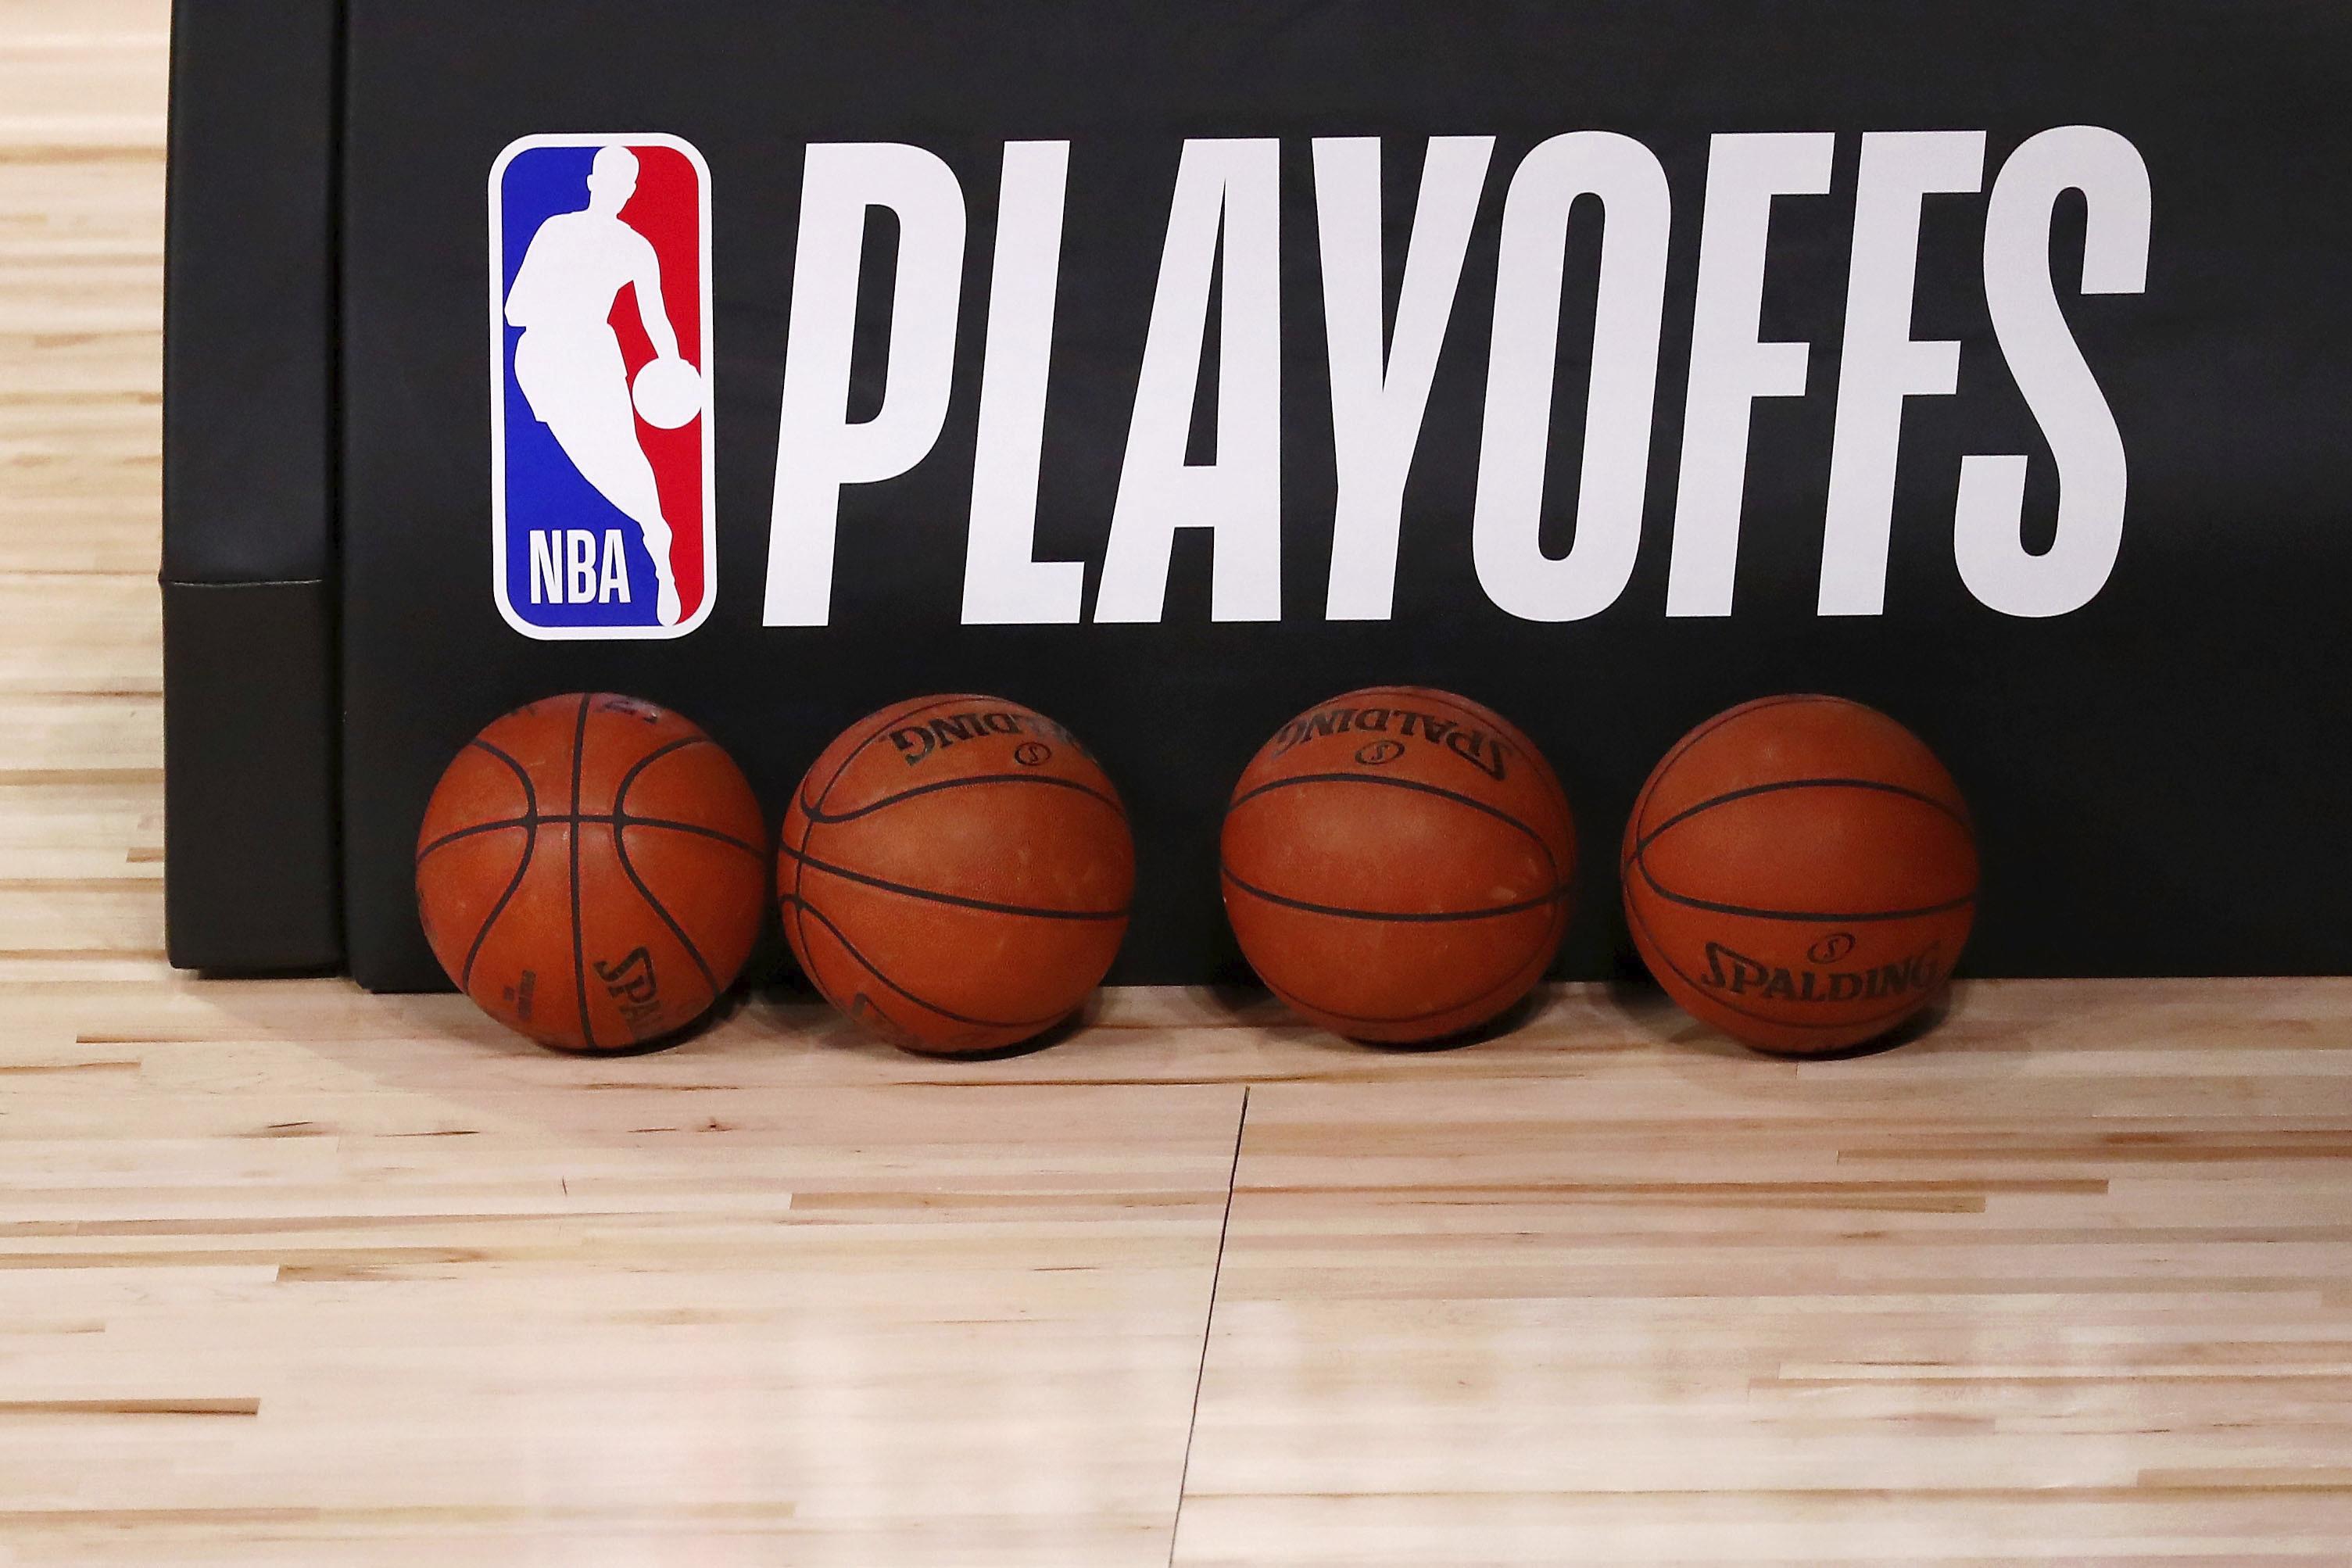 Calendrier Playoffs Nba 2021 NBA Schedule 2021: Playoffs, All Star Break and Key Dates